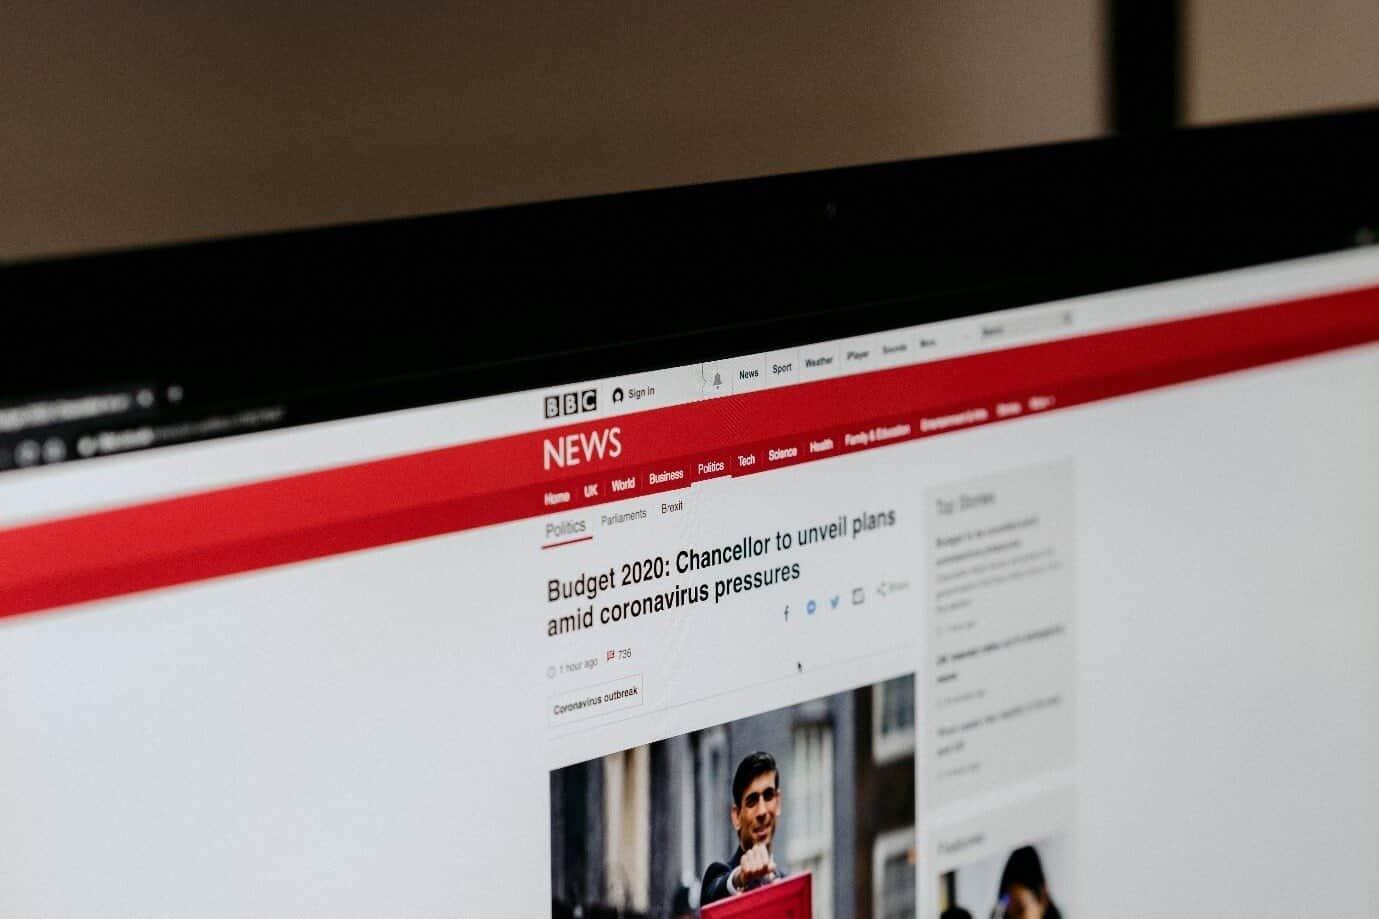 The Coronavirus is affecting many online websites